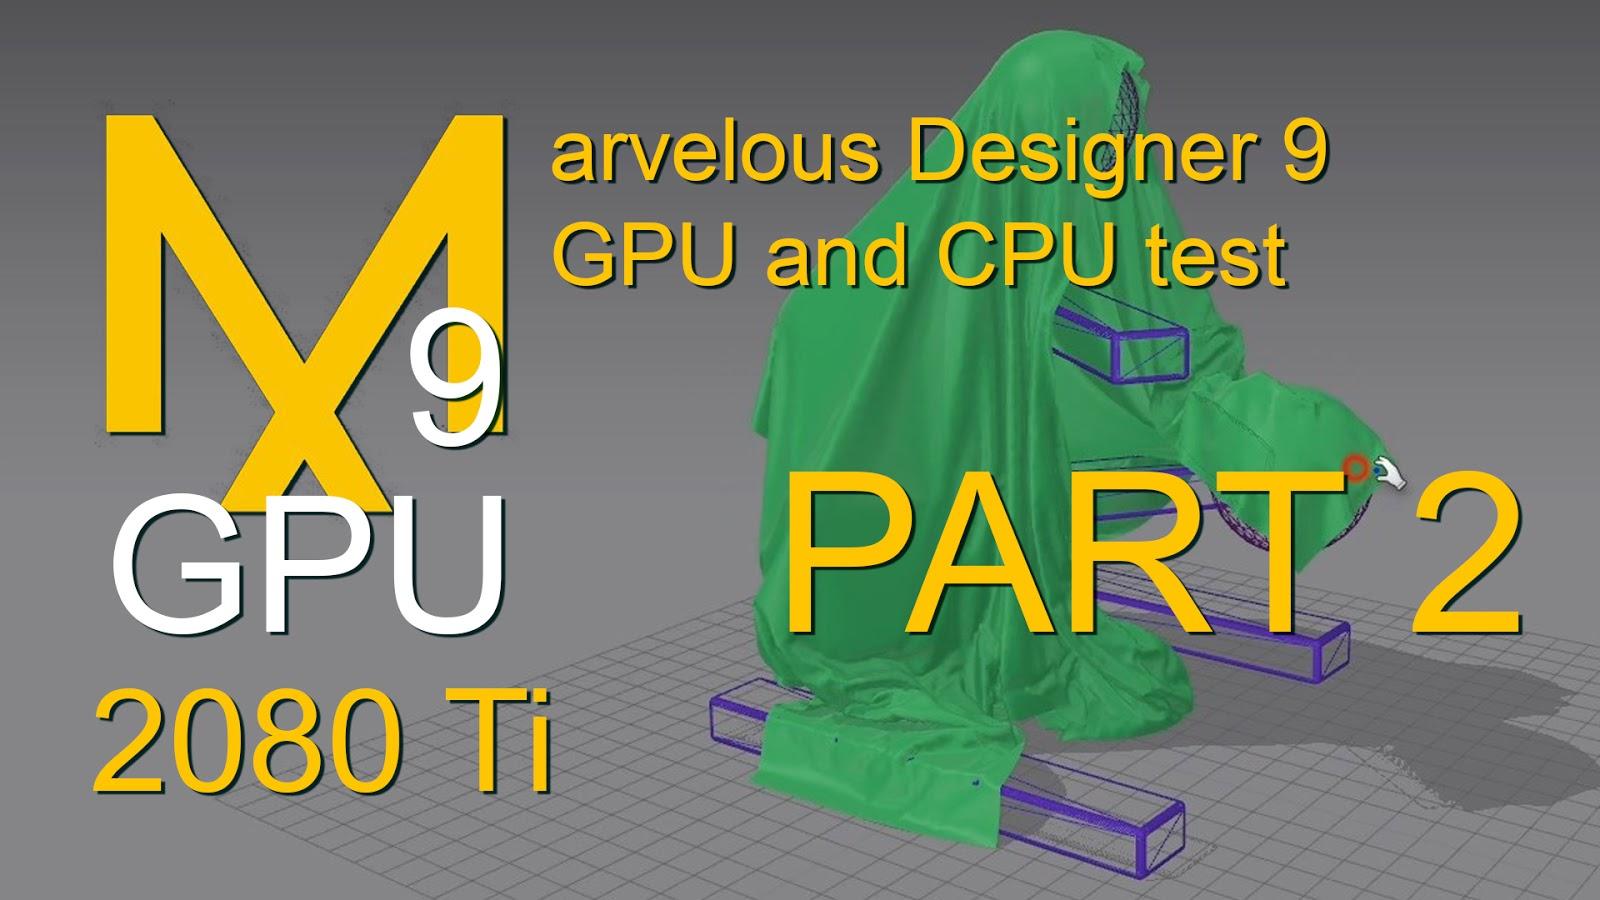 marvelous_designer_test_gpu_2080tip2.jpg